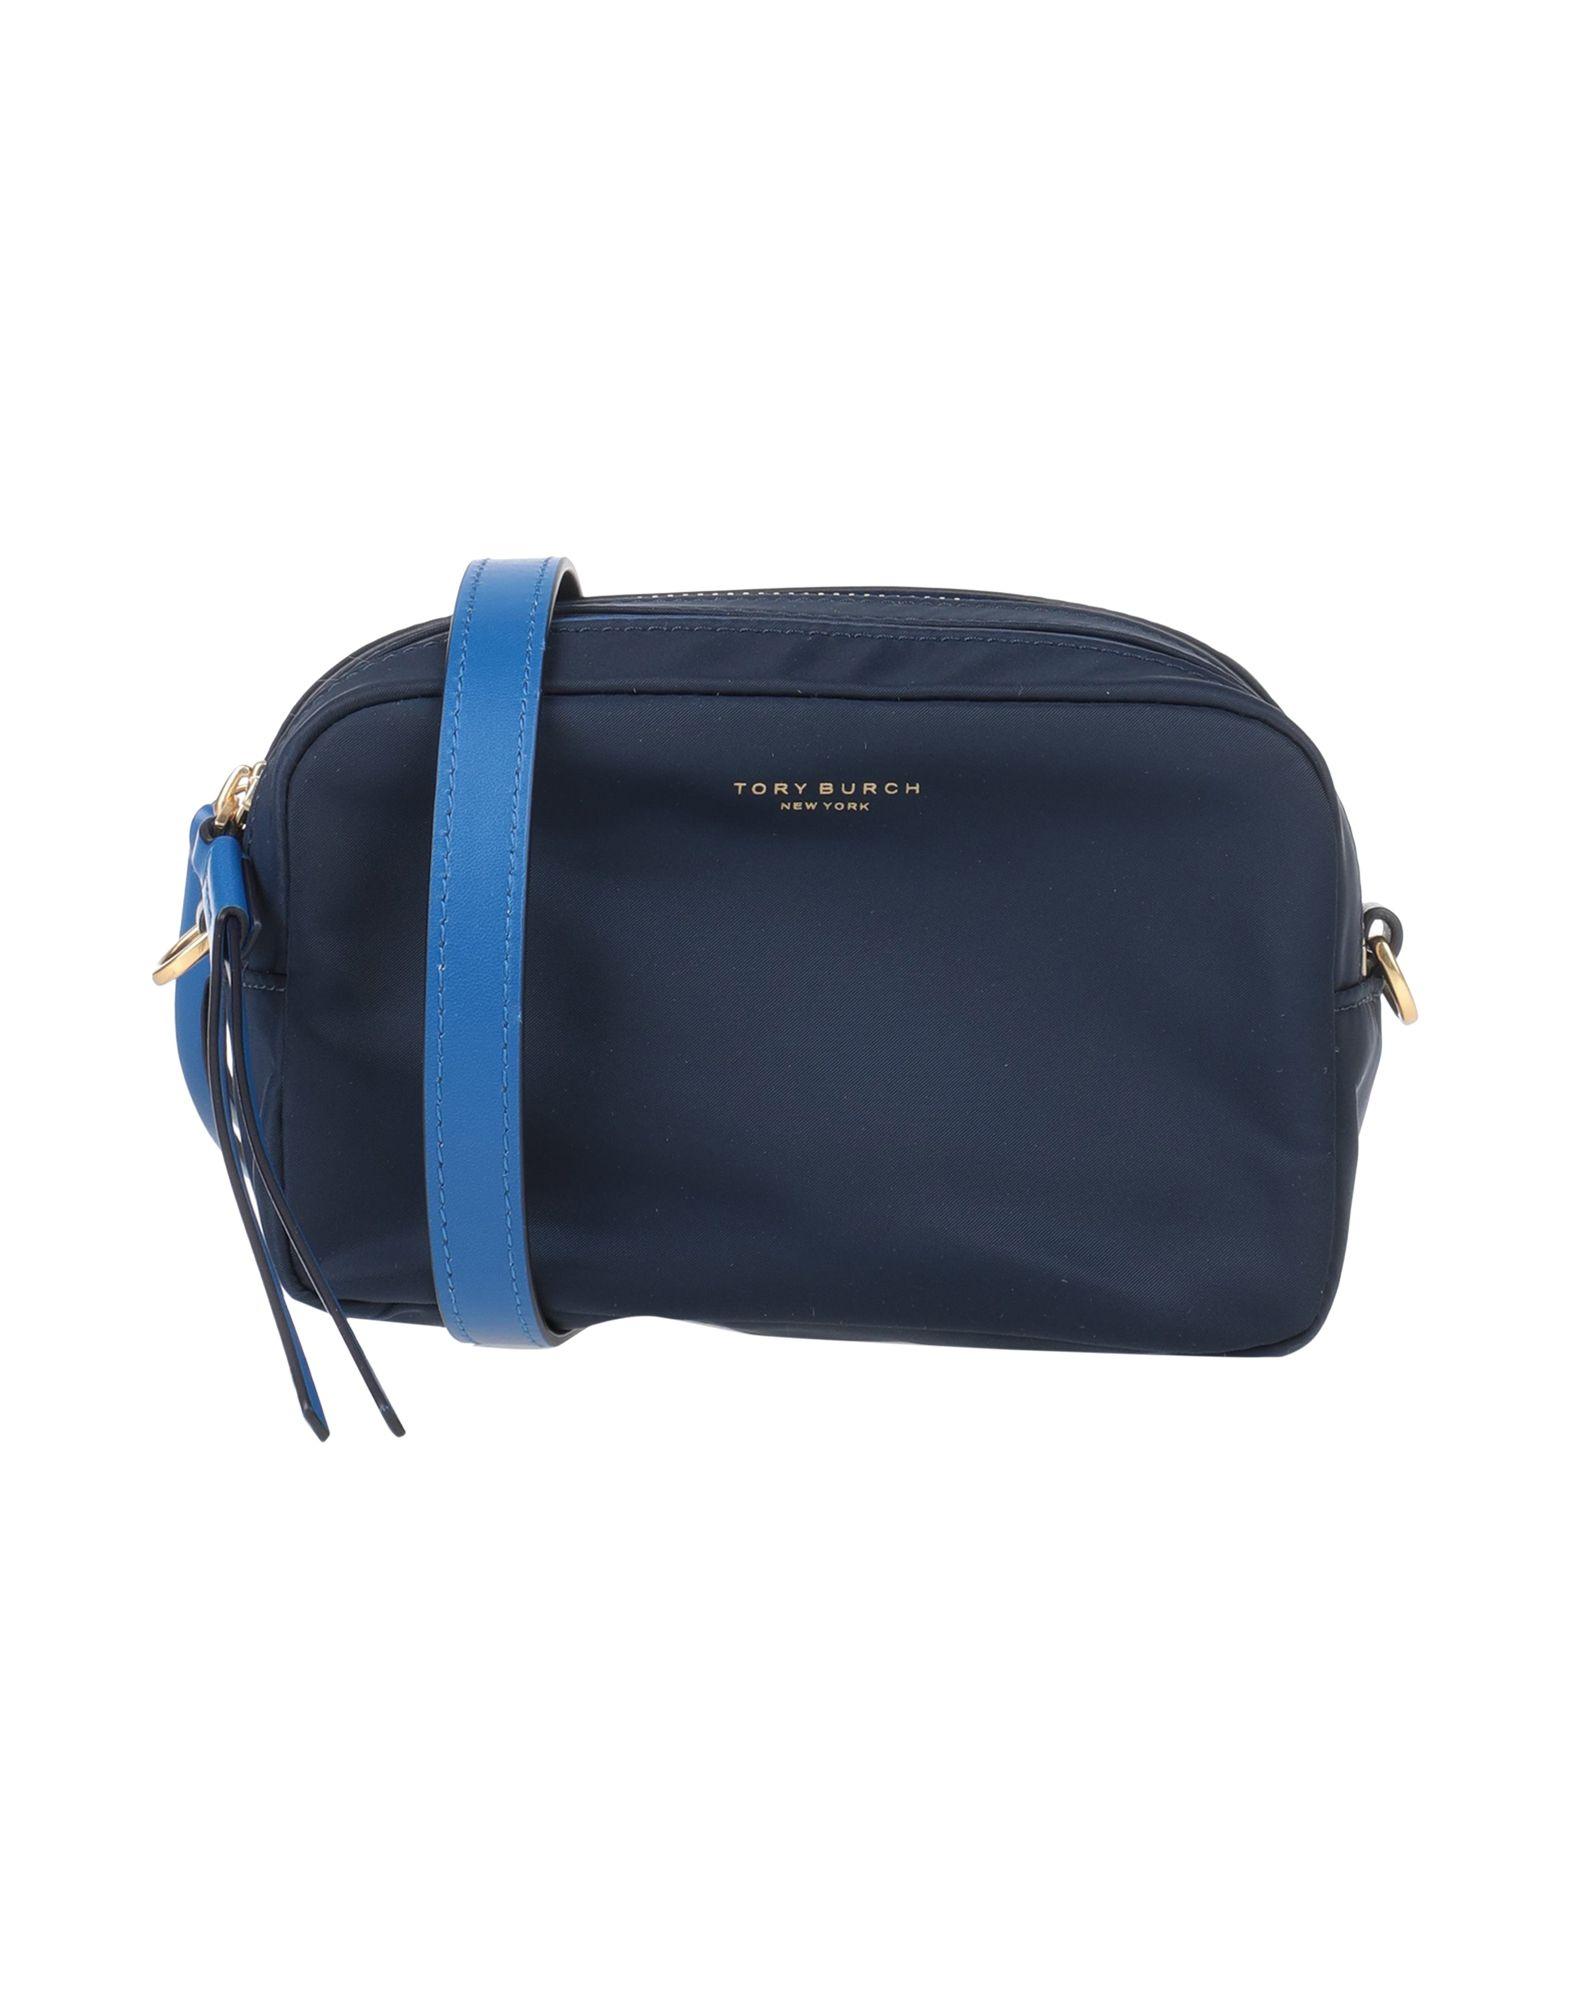 TORY BURCH Cross-body bags - Item 45527156